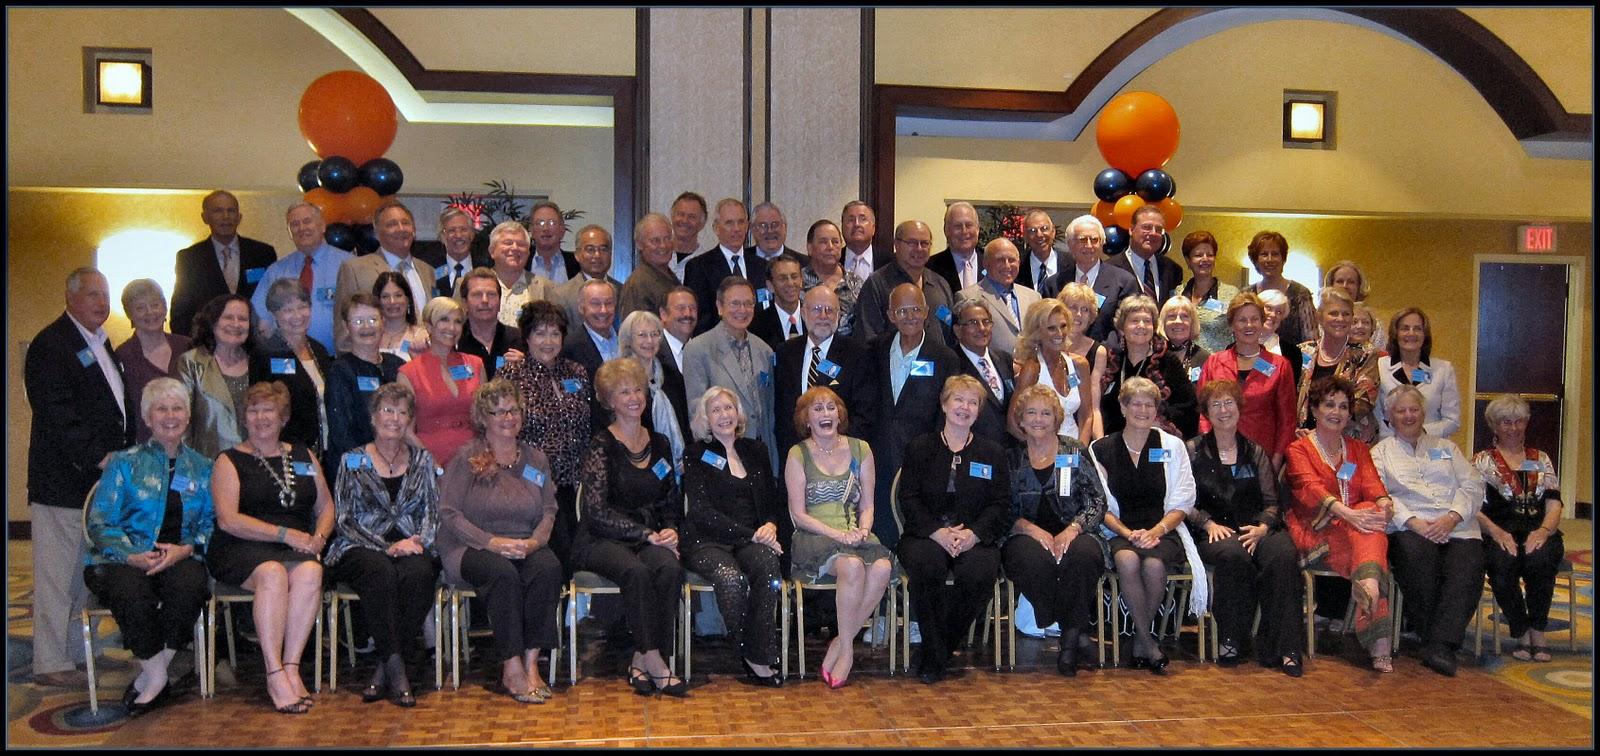 My 50th high school reunion in los angeles 9 25 2010 one american